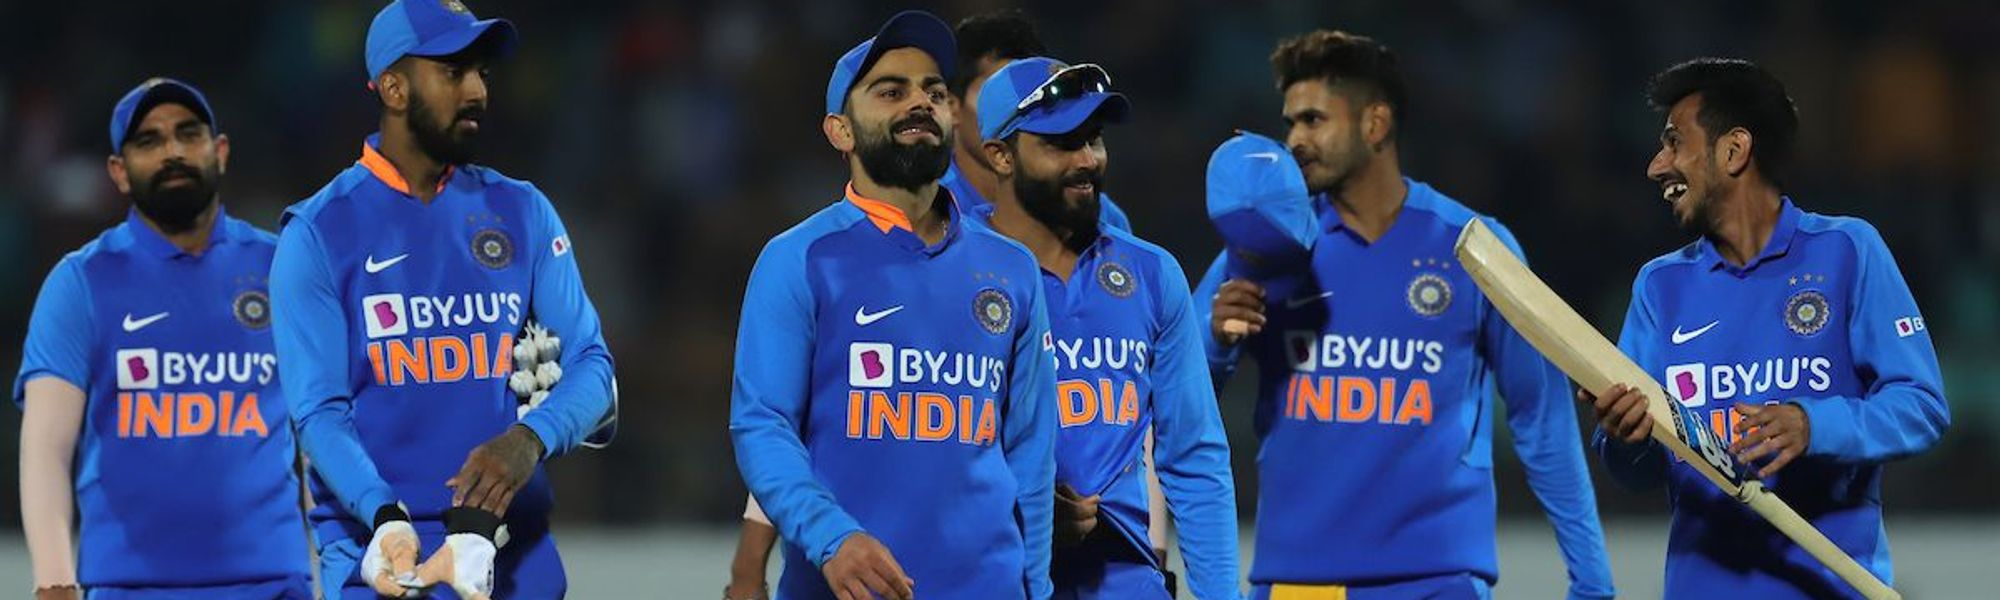 India Cricket >> India Australia Seek Final Flourish With Series On The Line